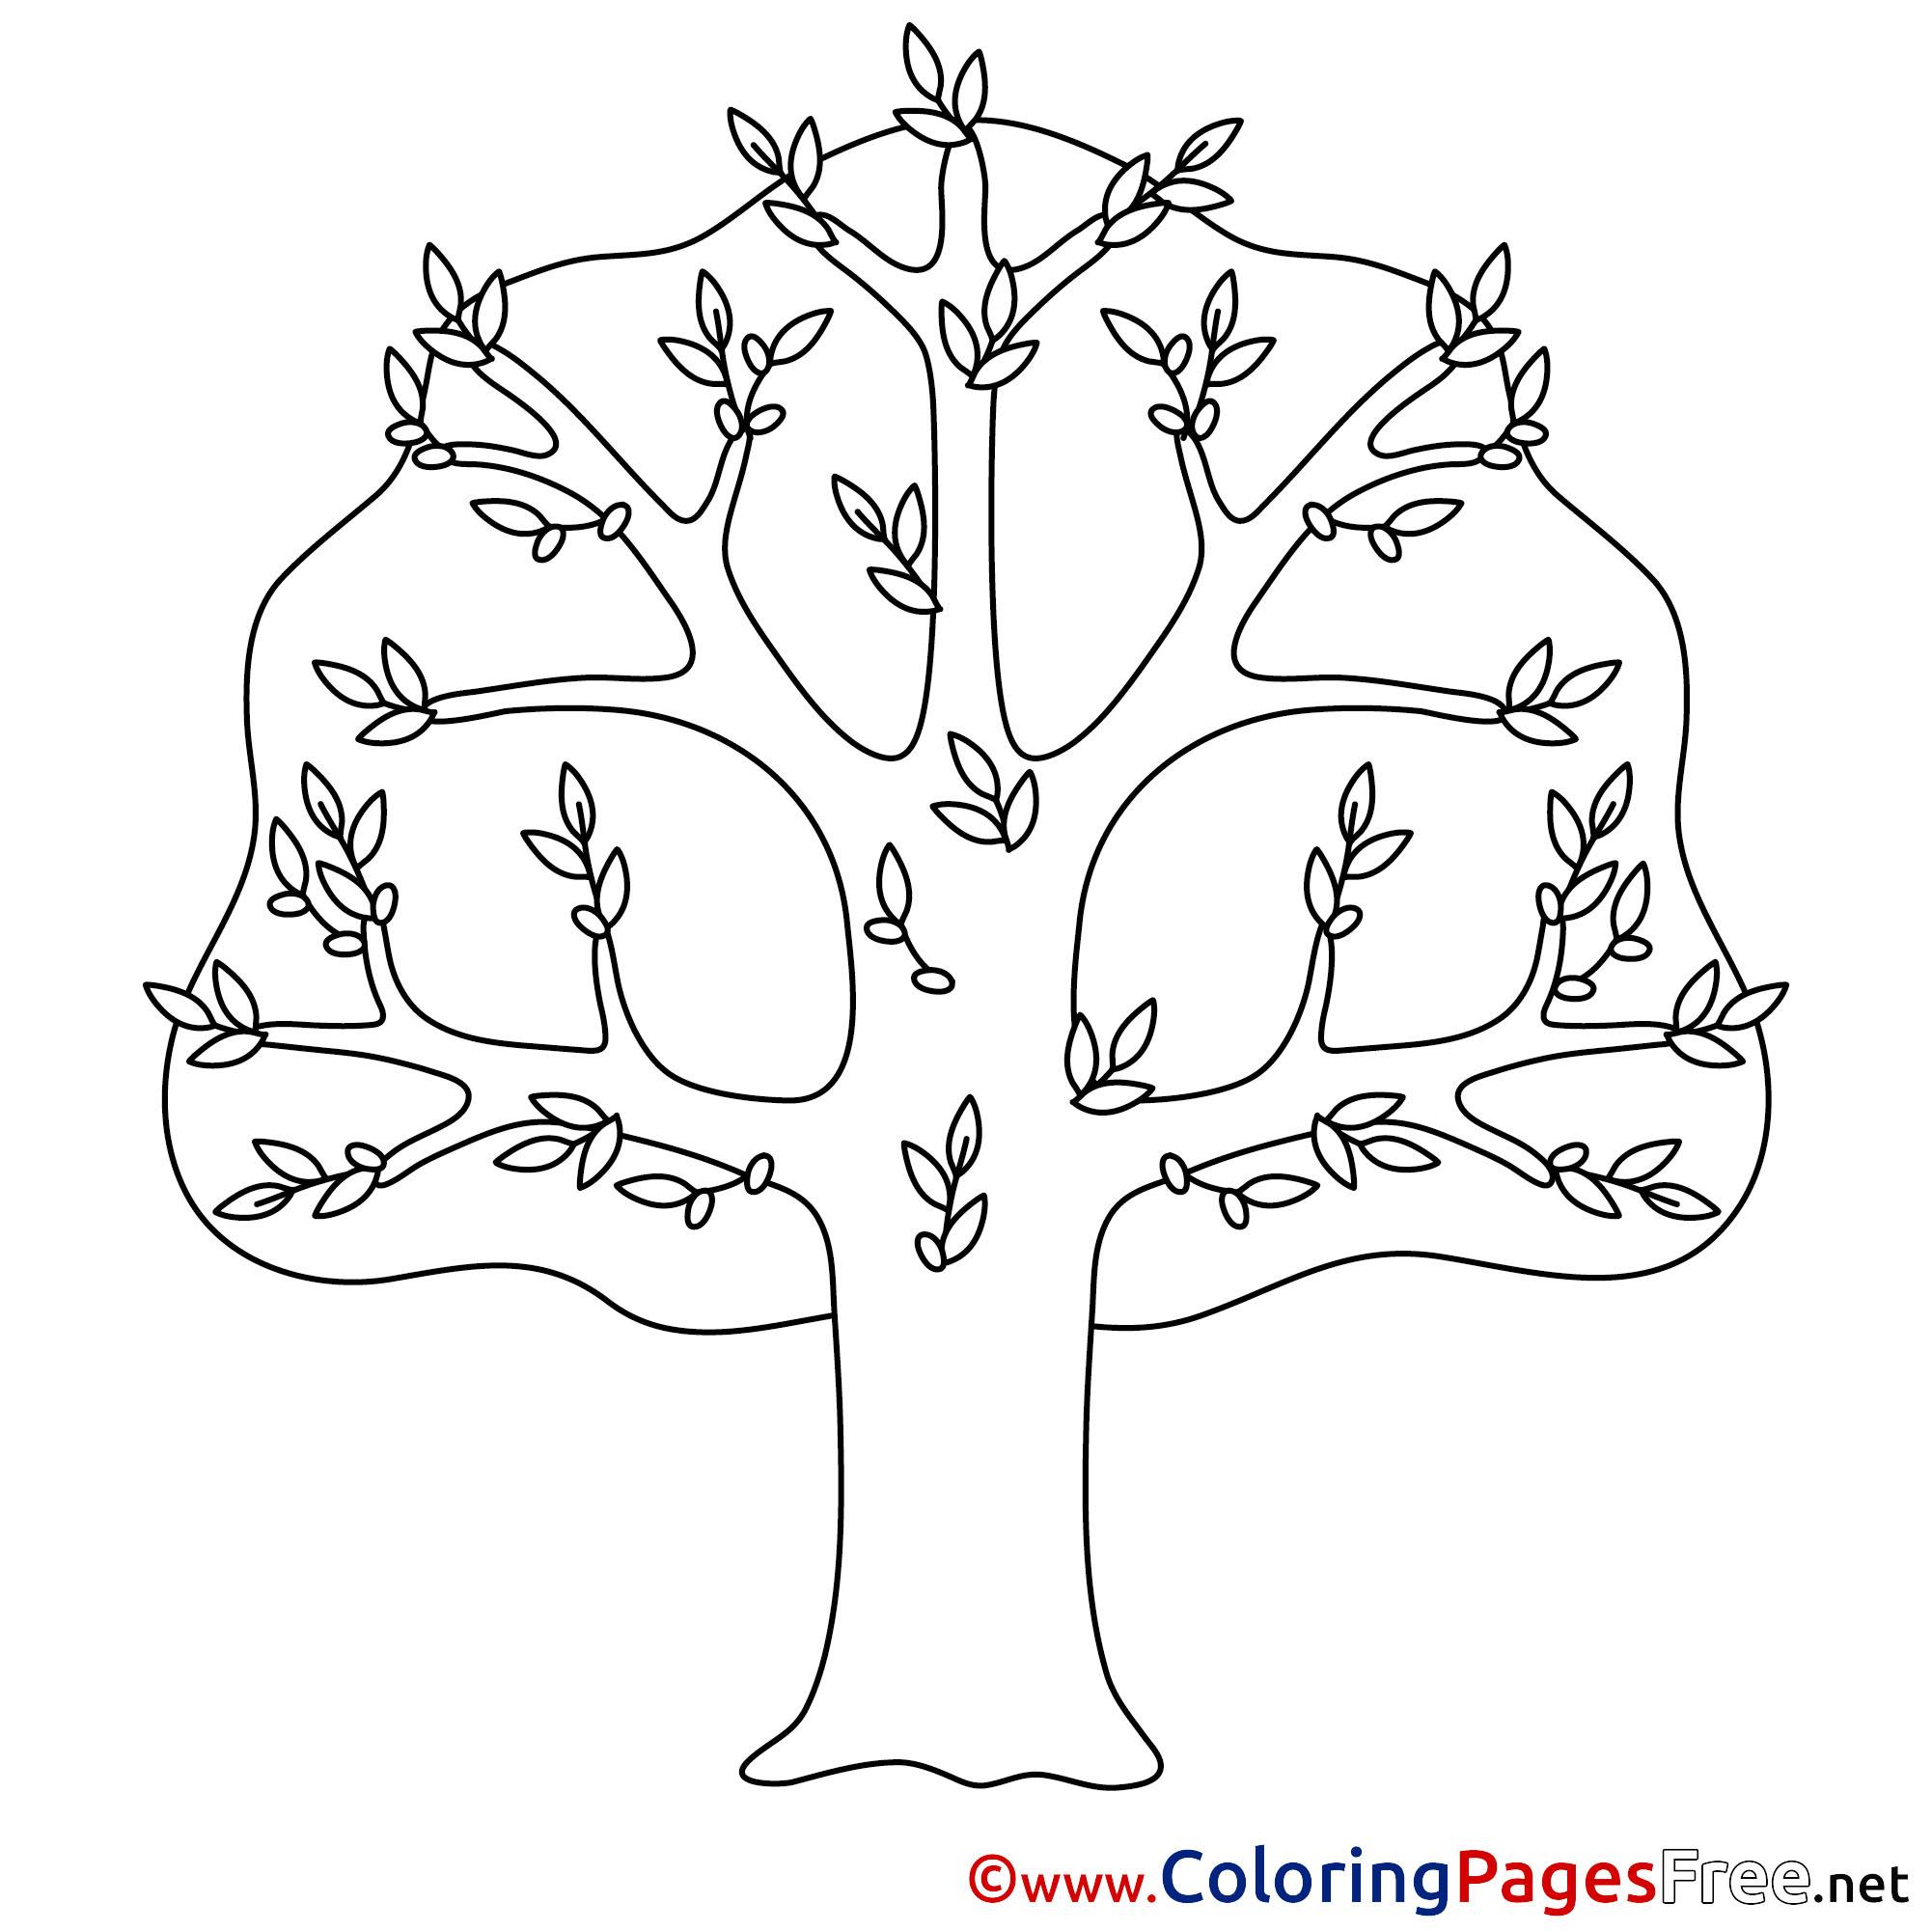 Free Printable Tree Coloring Pages For Kids - Kleurplaten, Bloem ... | 2001x2002